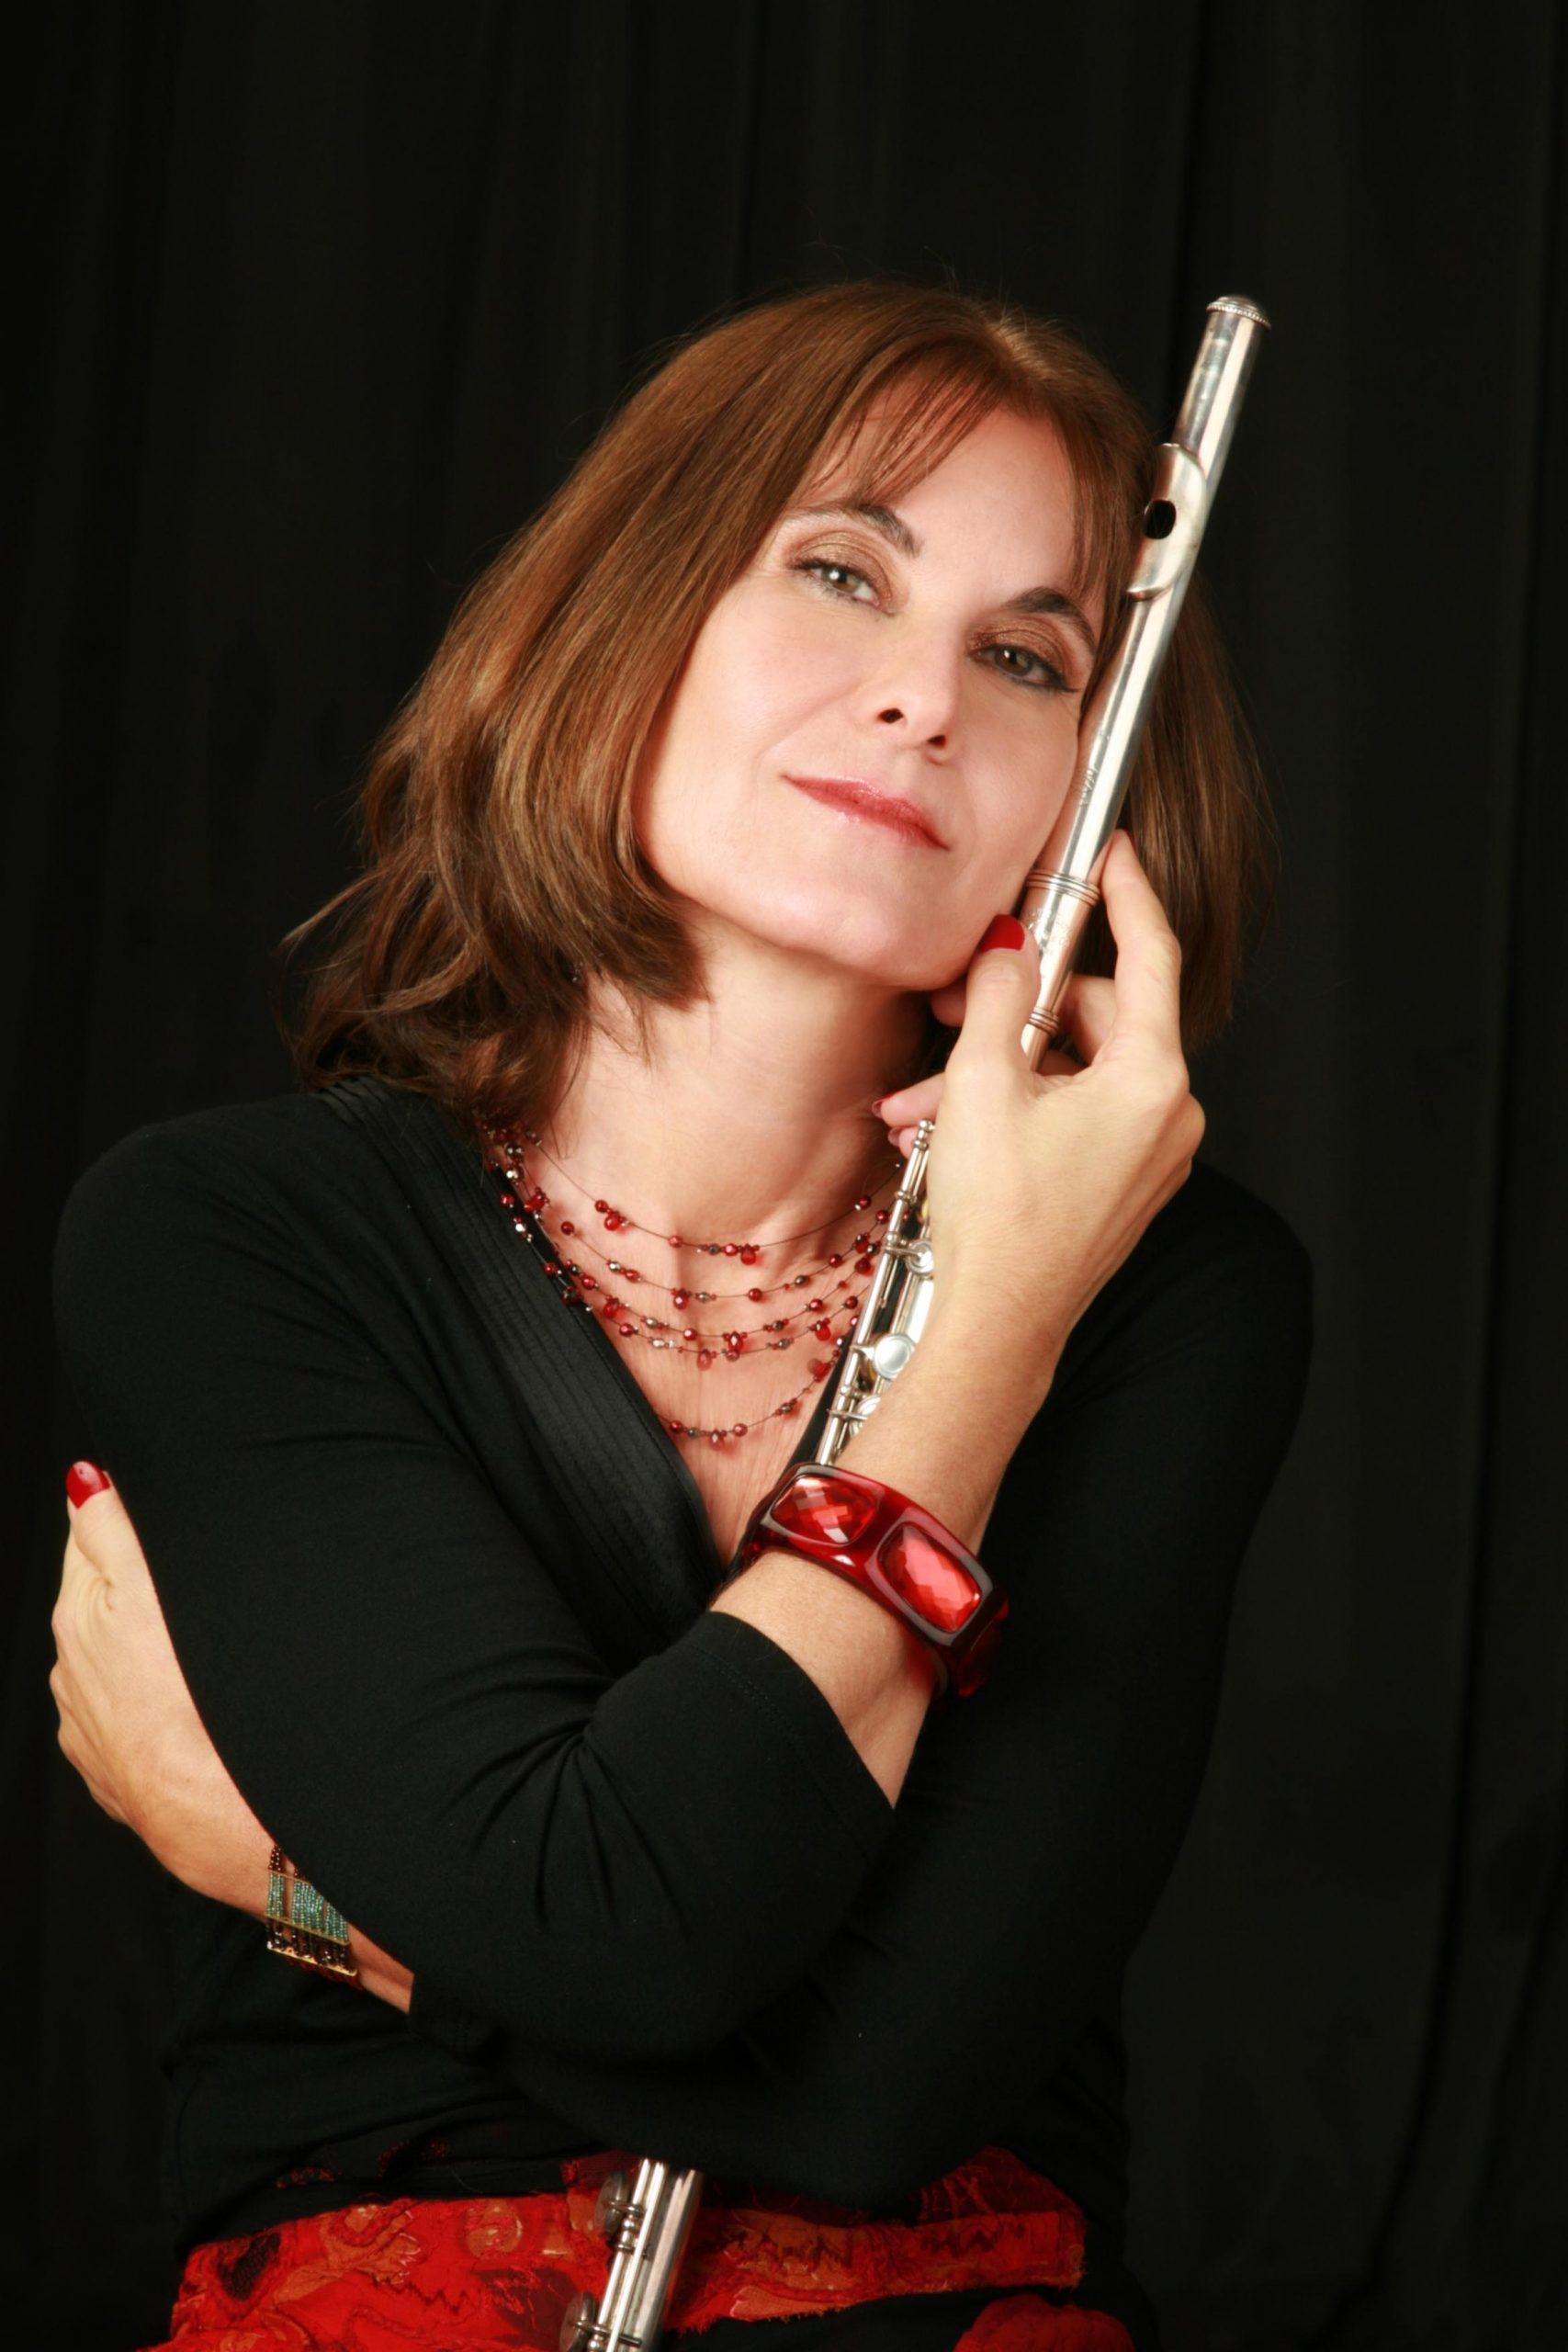 Andrea Branchfeld